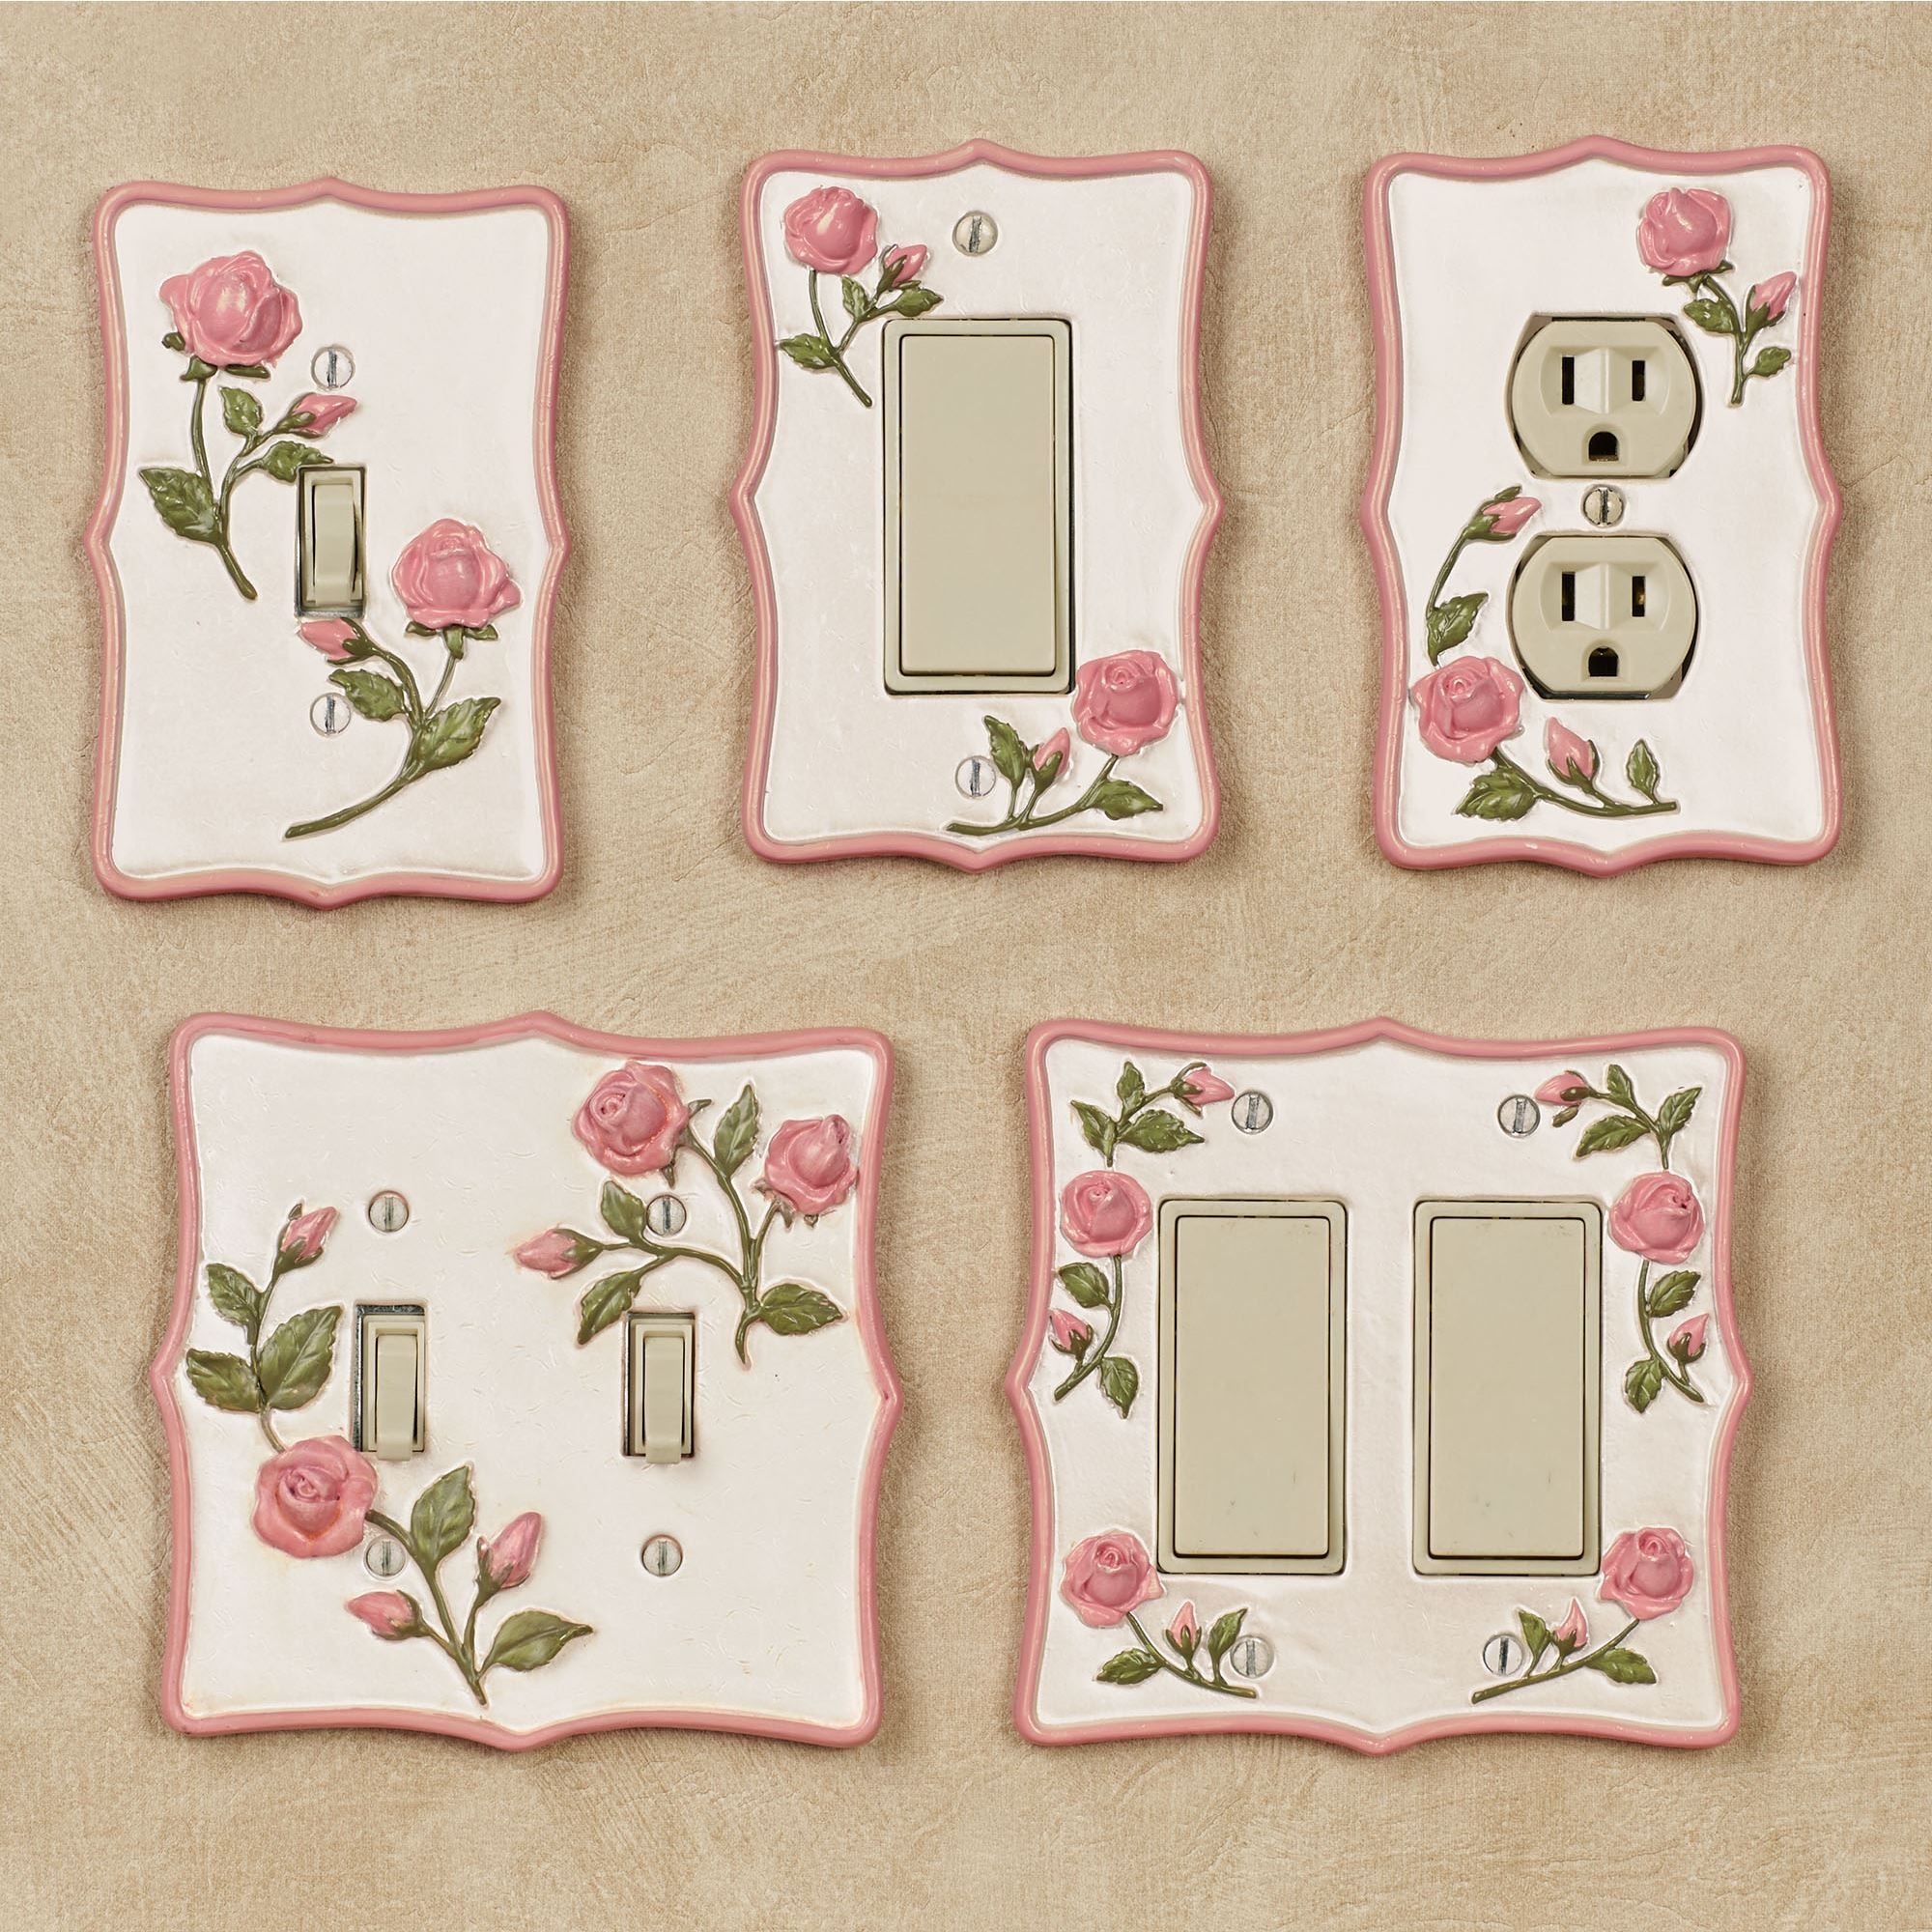 Bridal Rose Pink Floral Switchplates